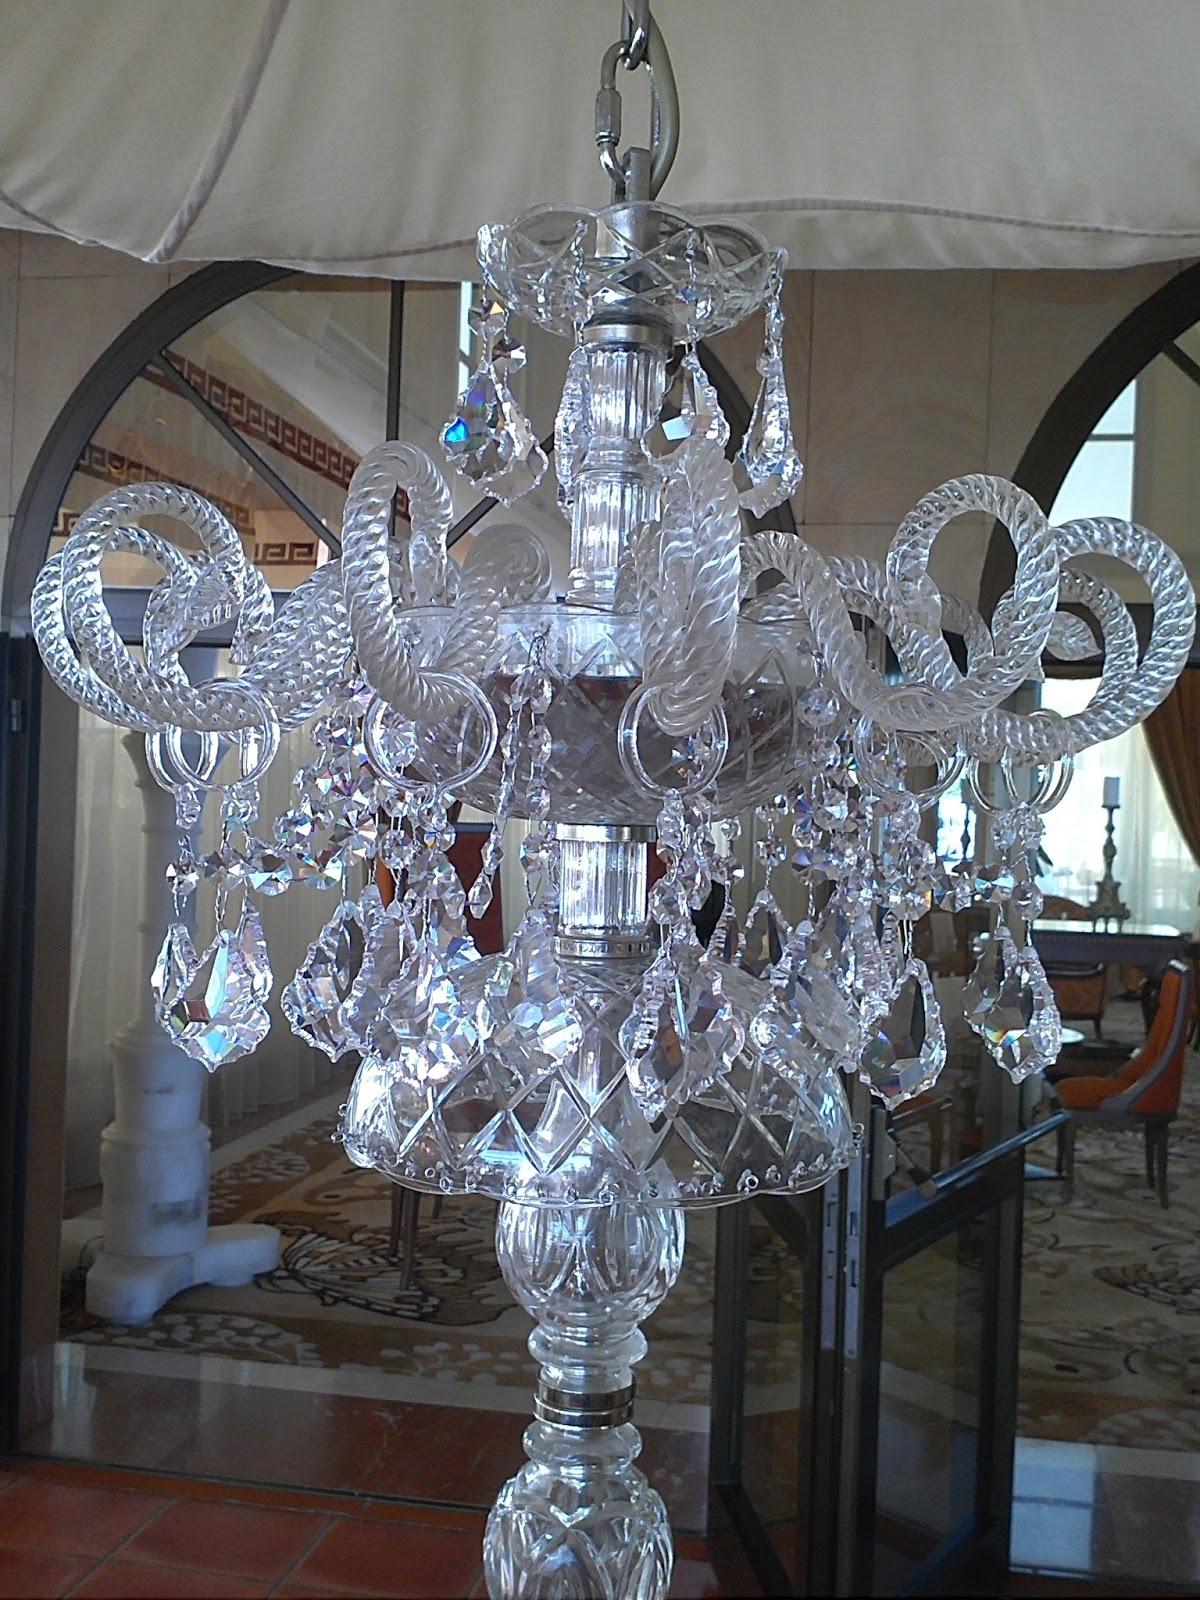 Restaurata cristal de roca vidrio o cristal - Lamparas cristal antiguas ...